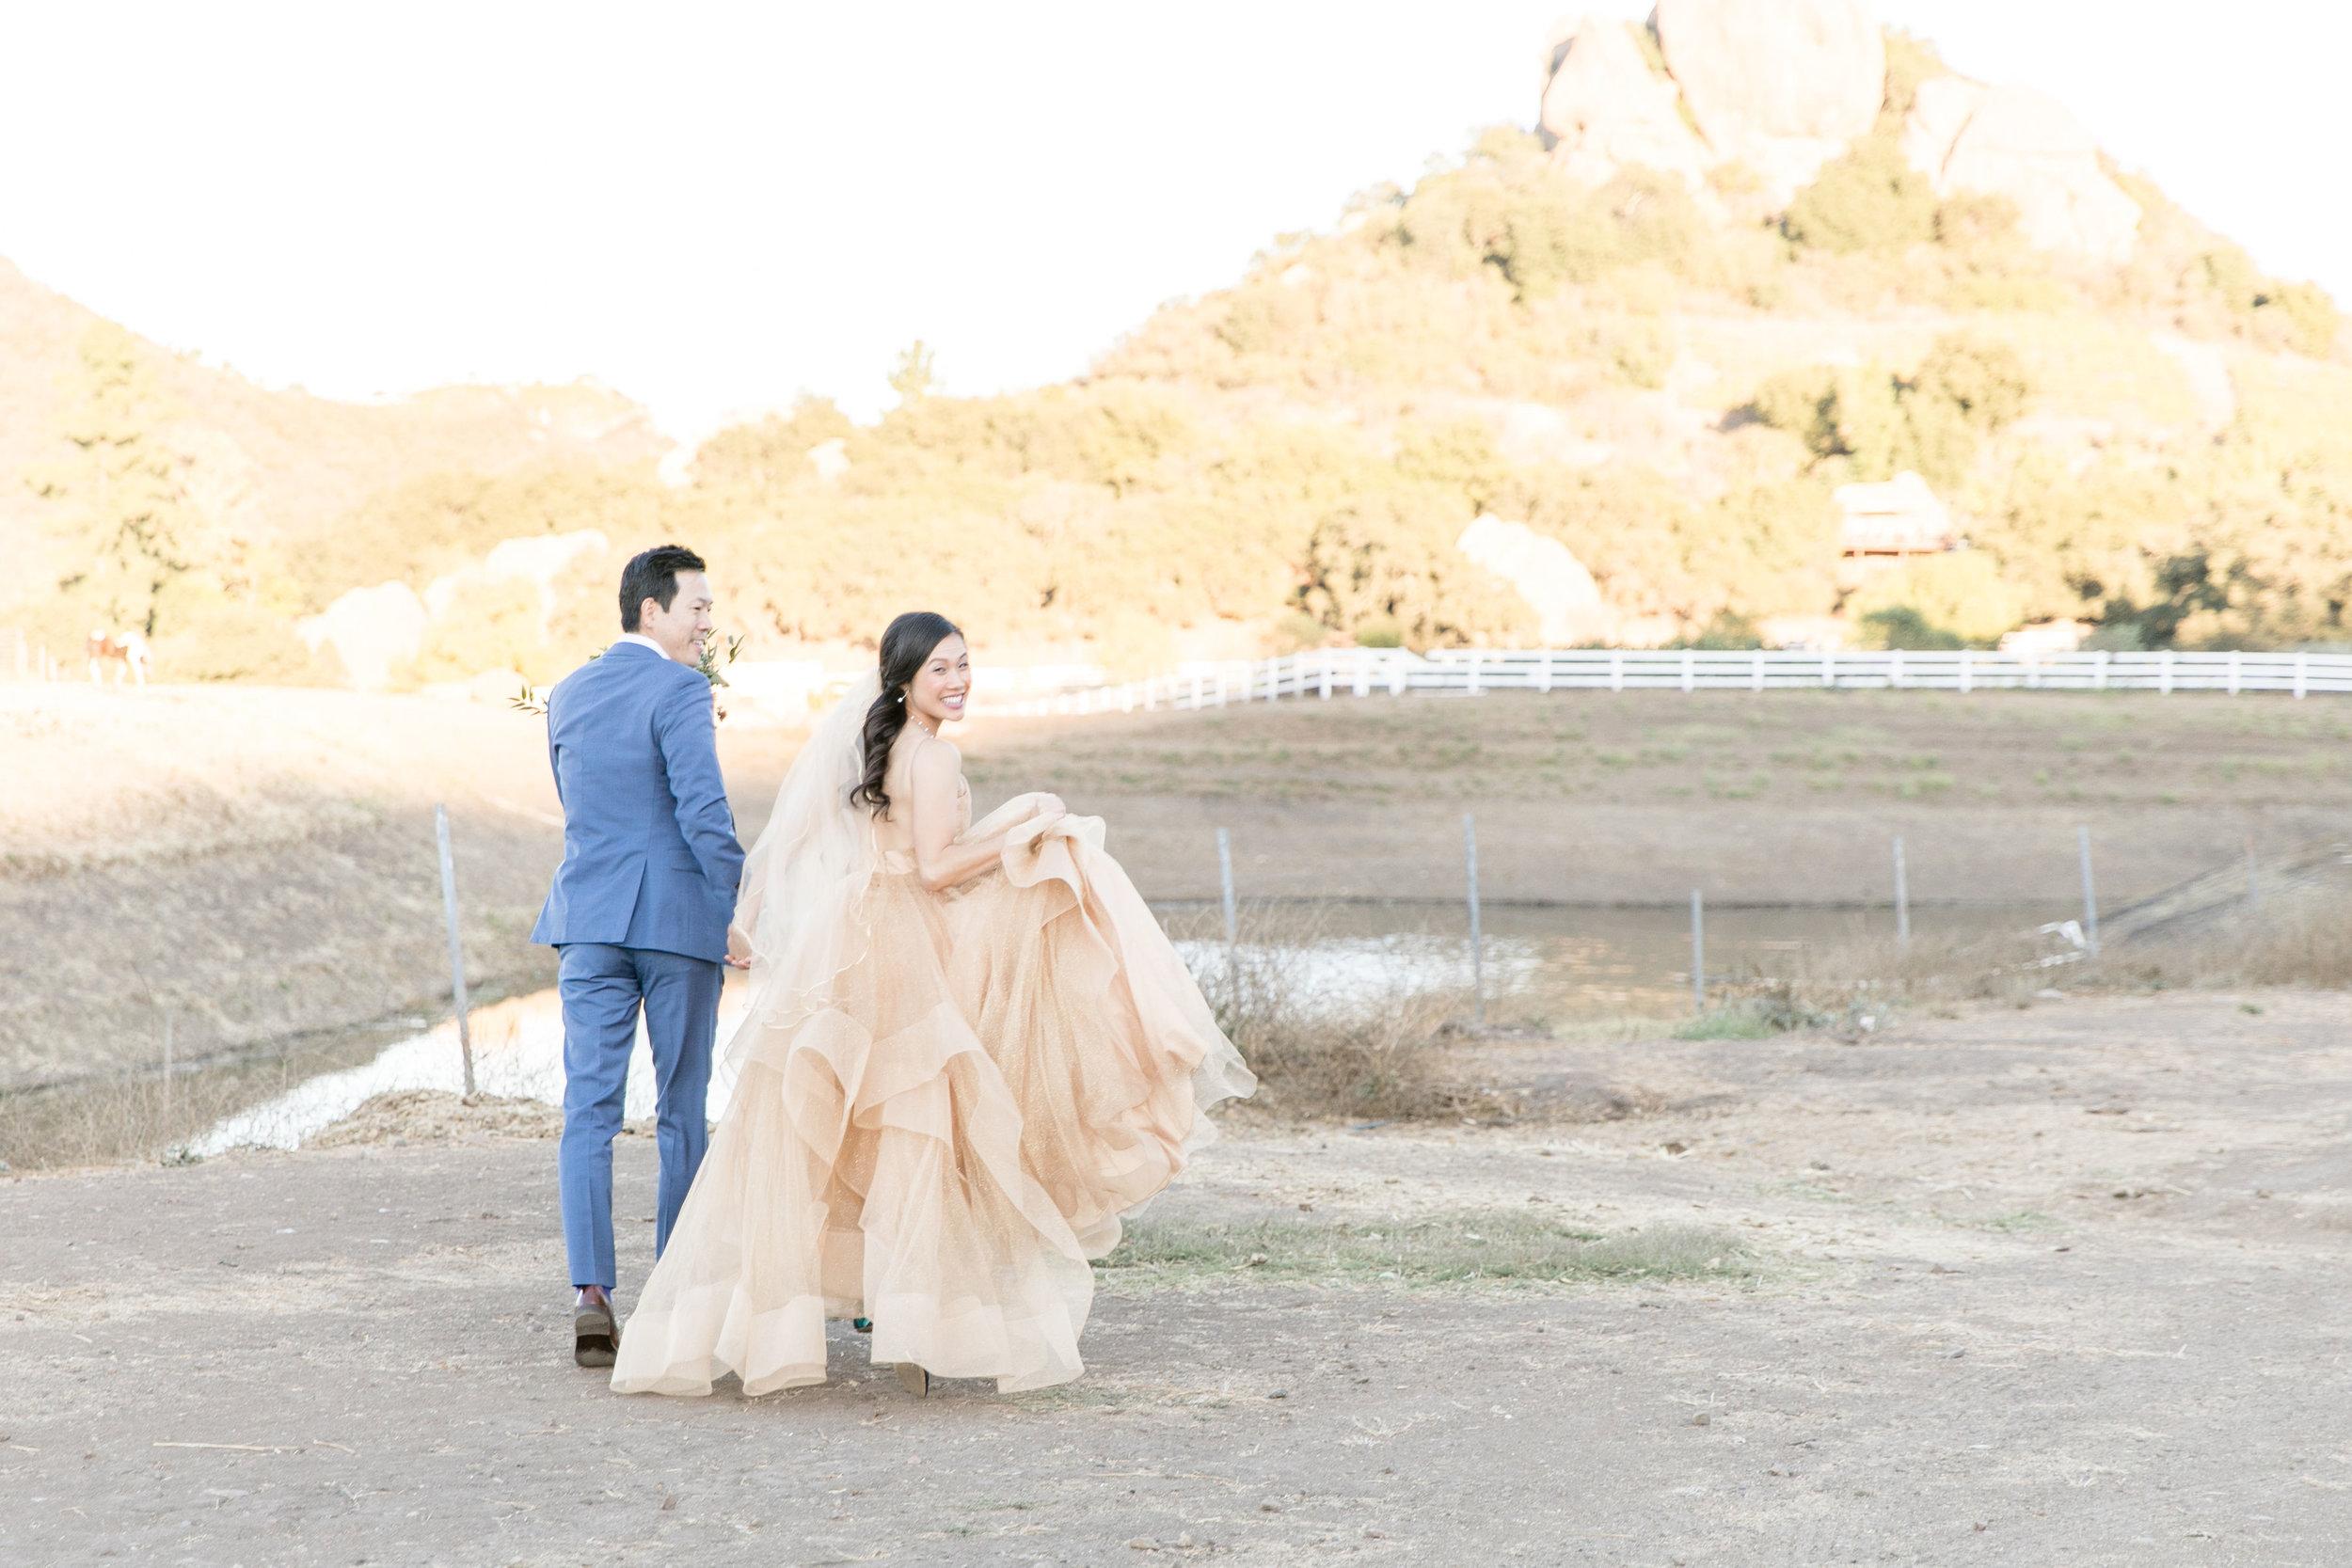 Melanie+Seiji-saddlerockranch-malibucaliforniawedding-couplesportraitsandweddingparty-0269.jpg